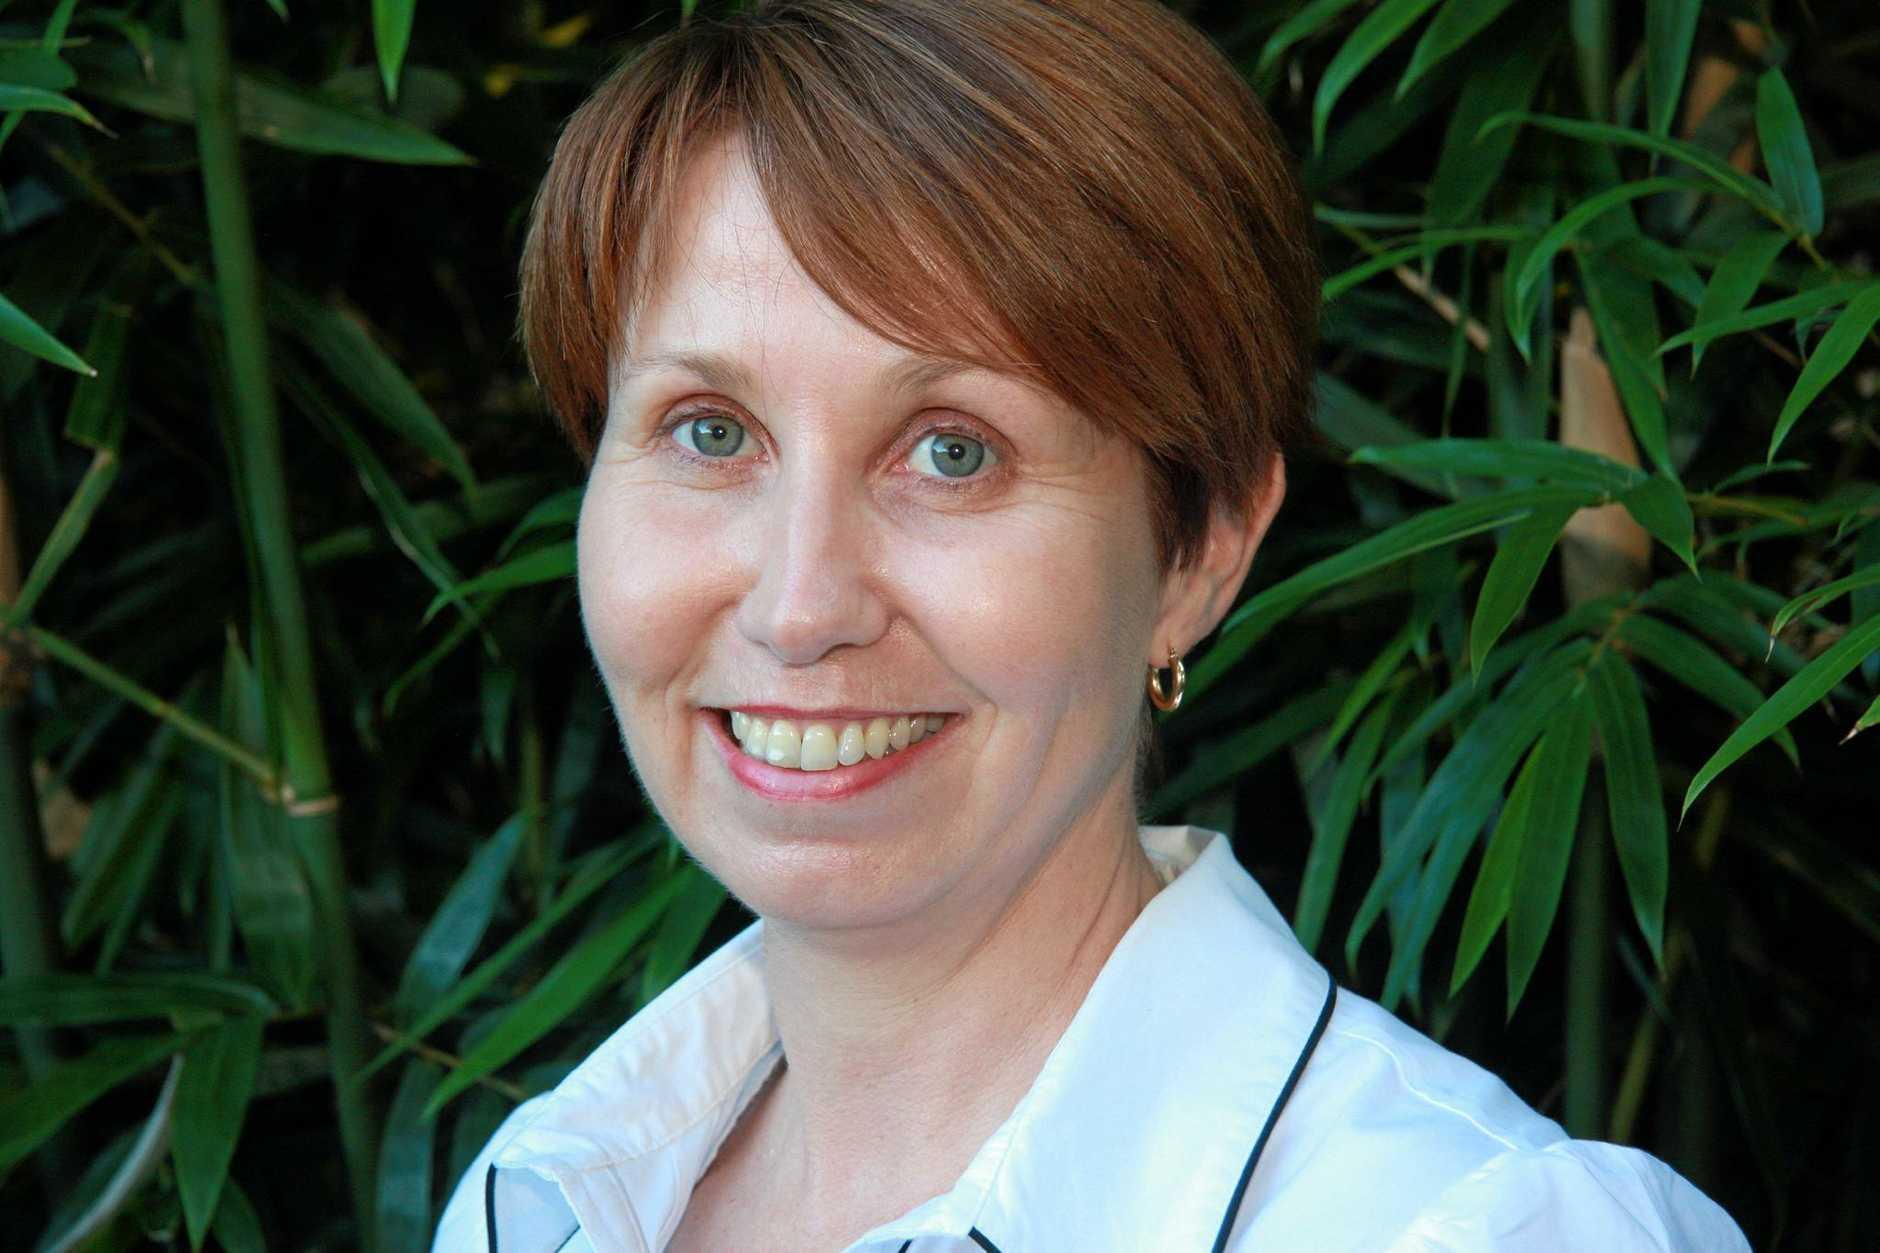 VALE: Nambour Medical Centre GP Dr Christine Orazio will be farewelled in Maroochydore today.